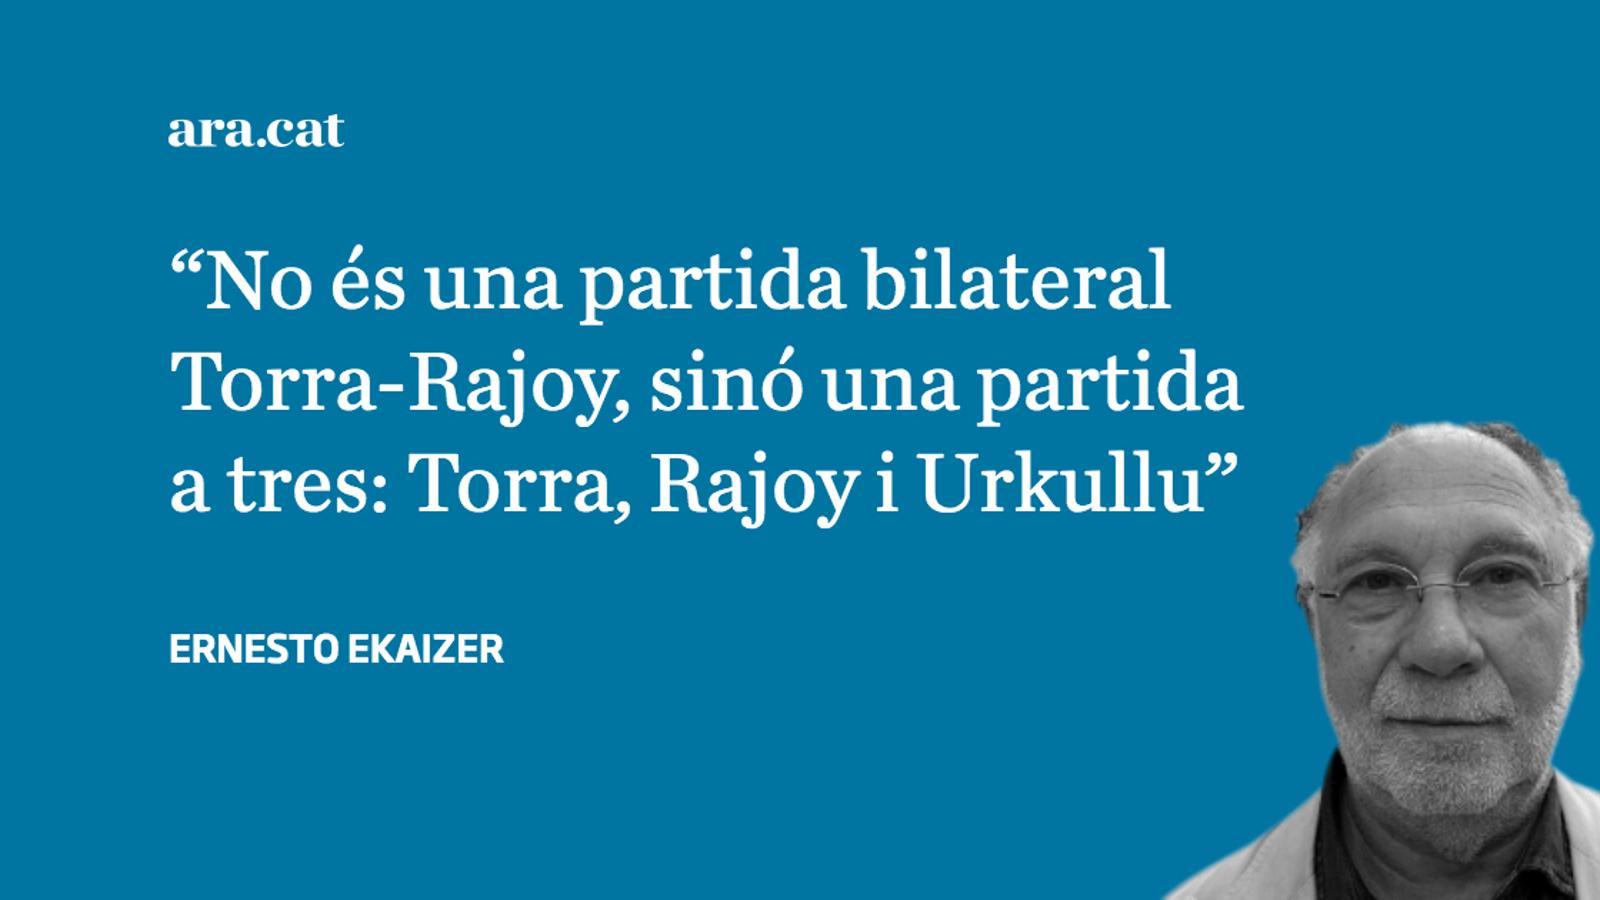 La partida Torra-Rajoy-Urkullu